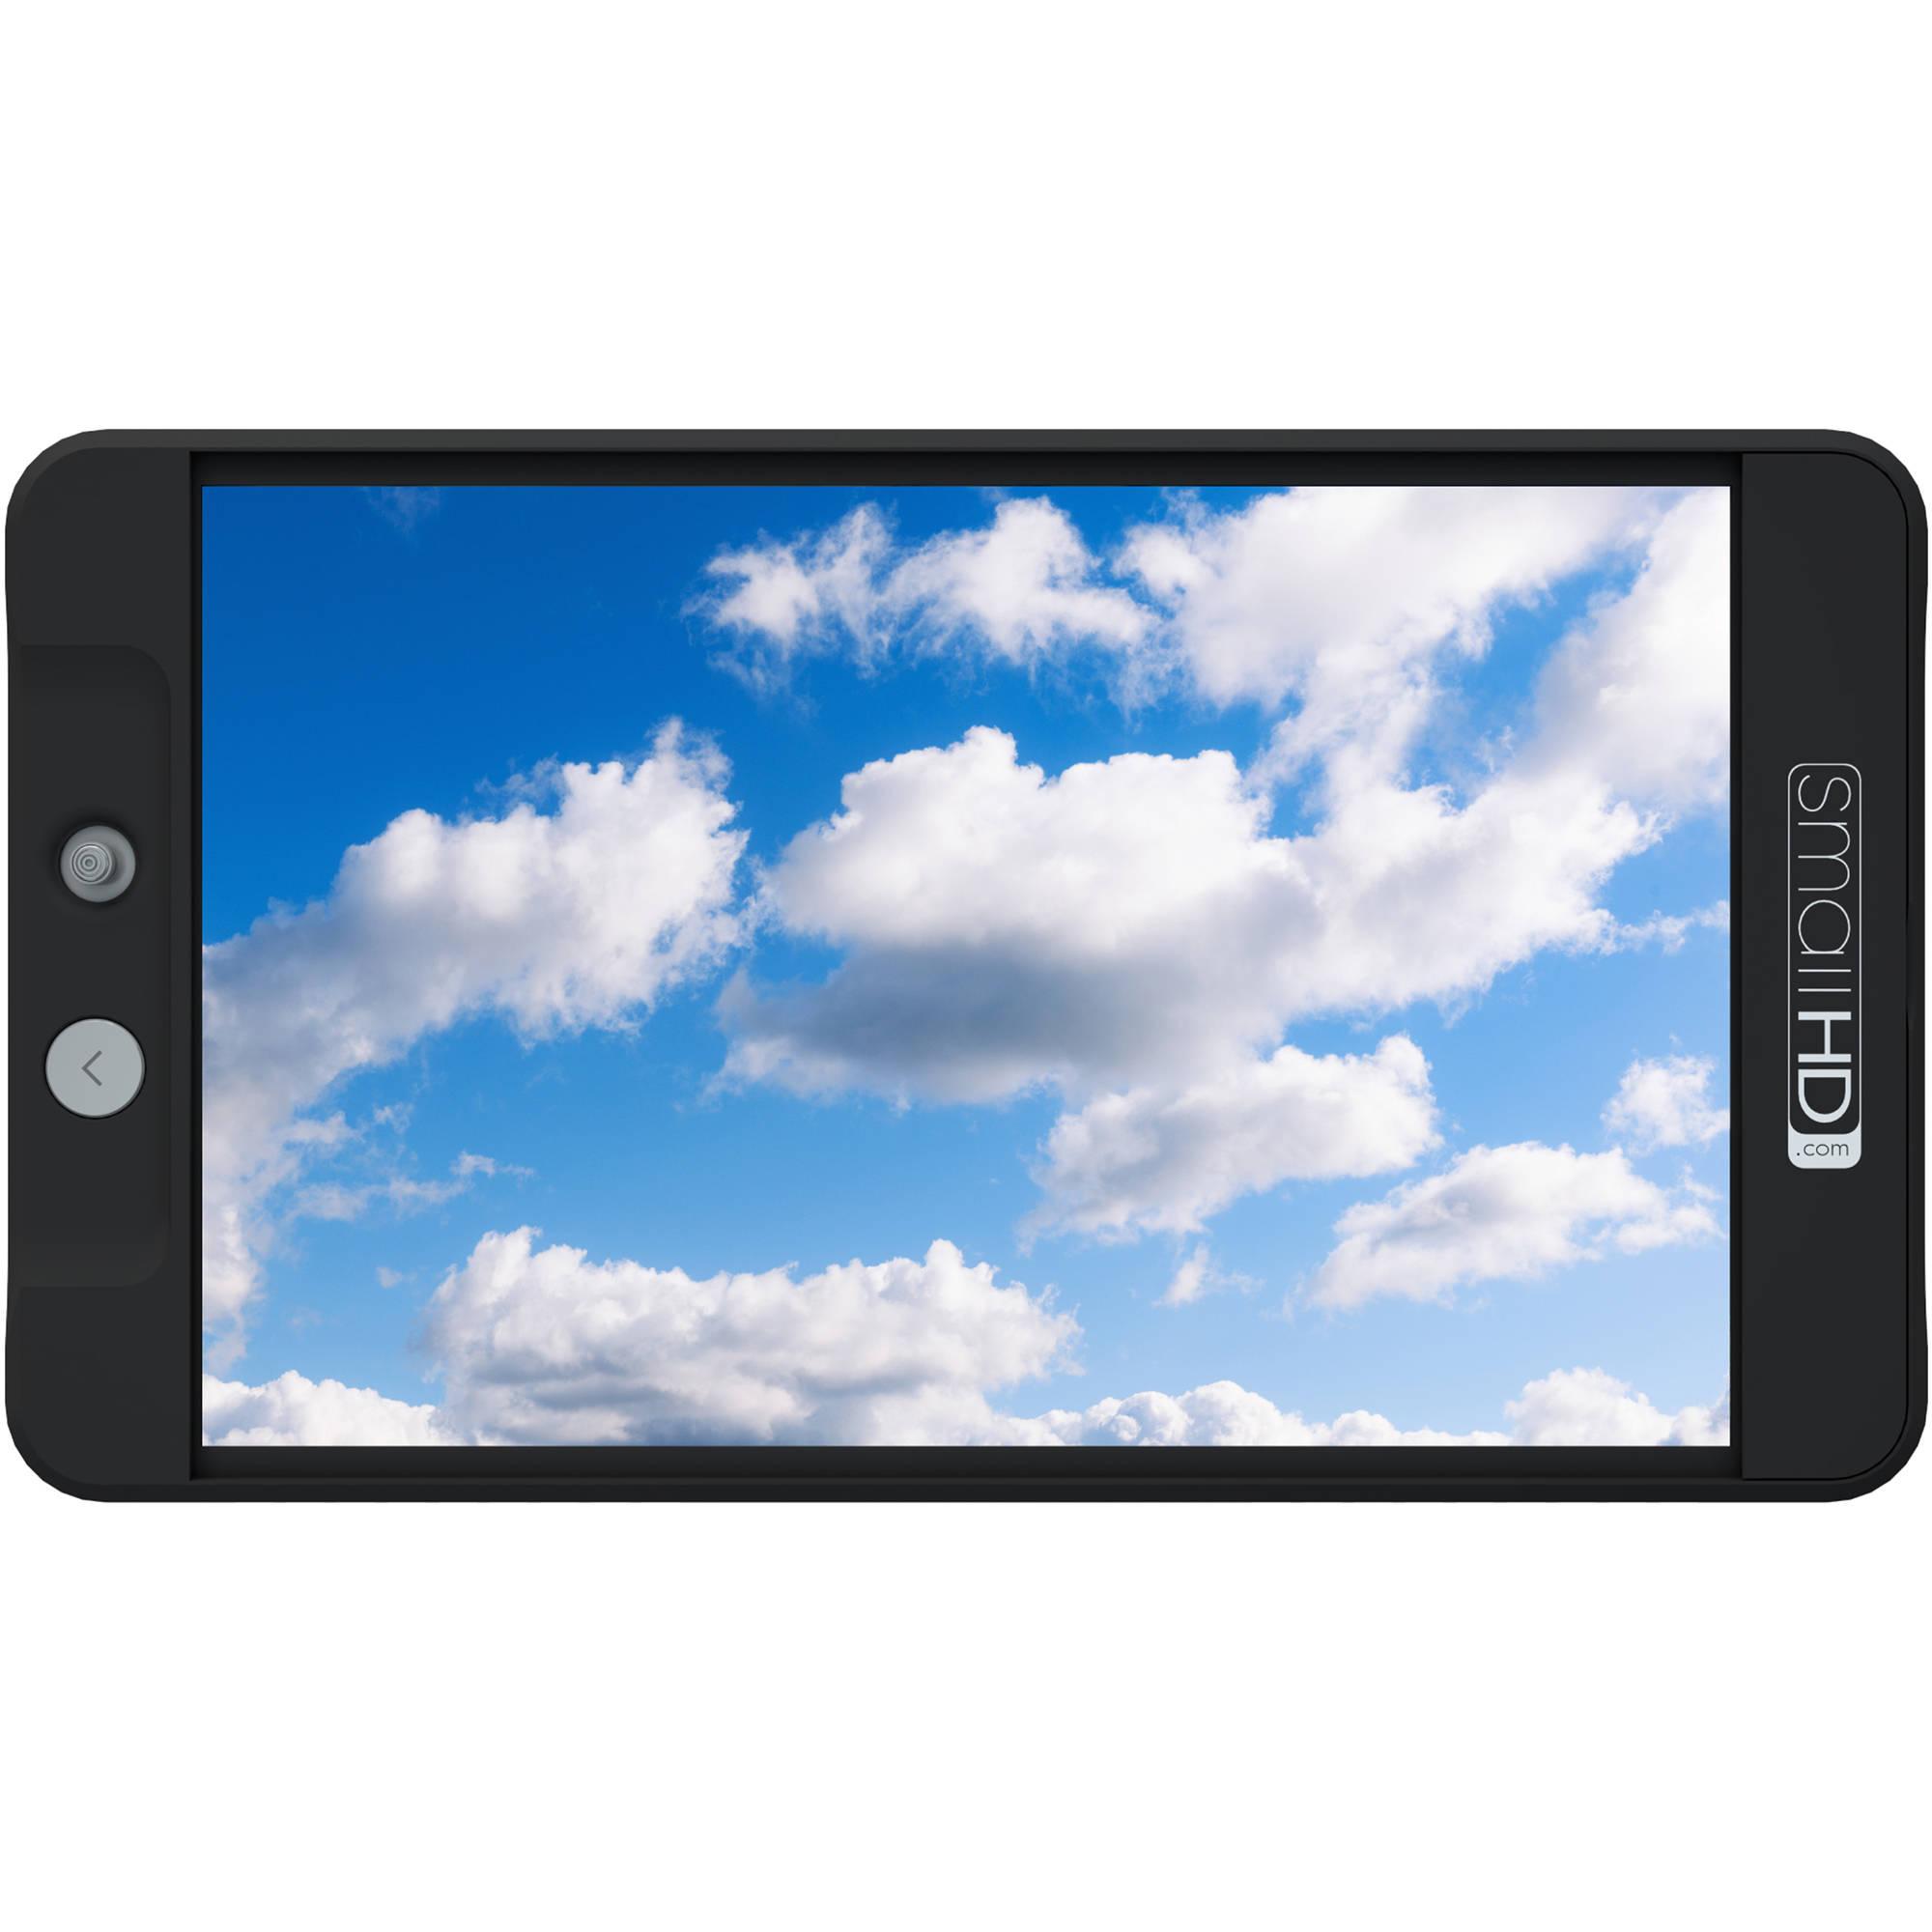 SmallHD 701 Lite Field Monitor Windows 7